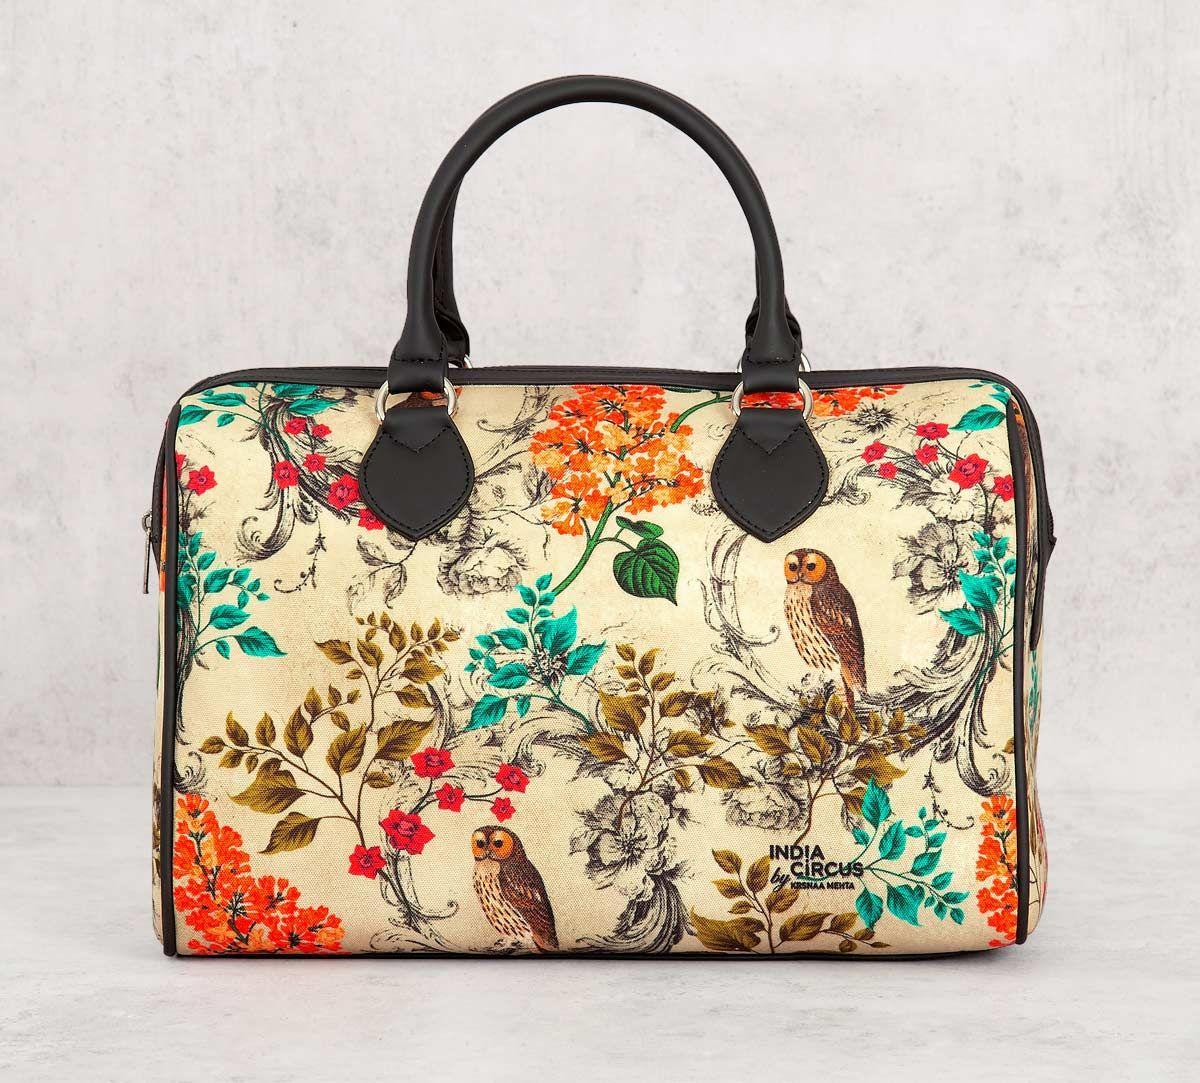 India Circus Floral Hooting Duffle Bag